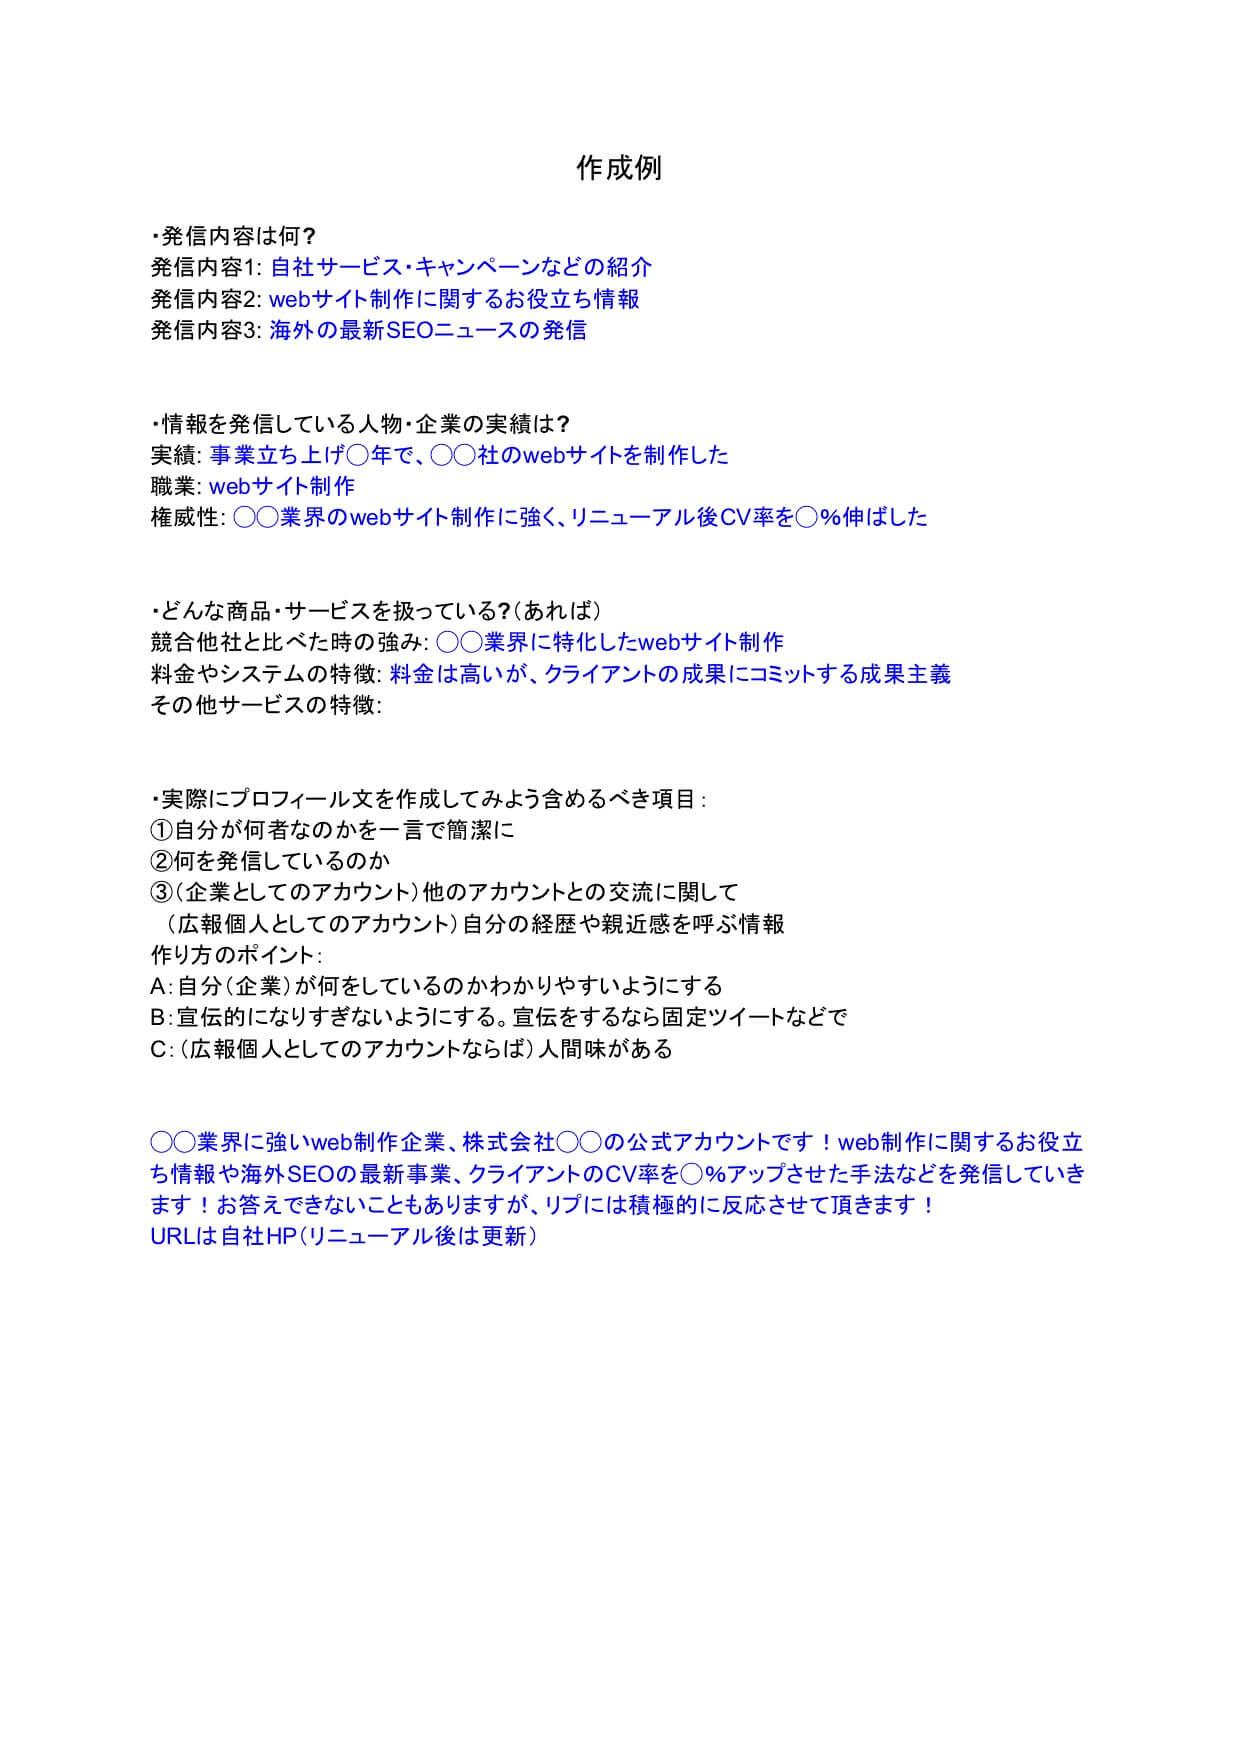 Twitterプロフィール文の作成シート2